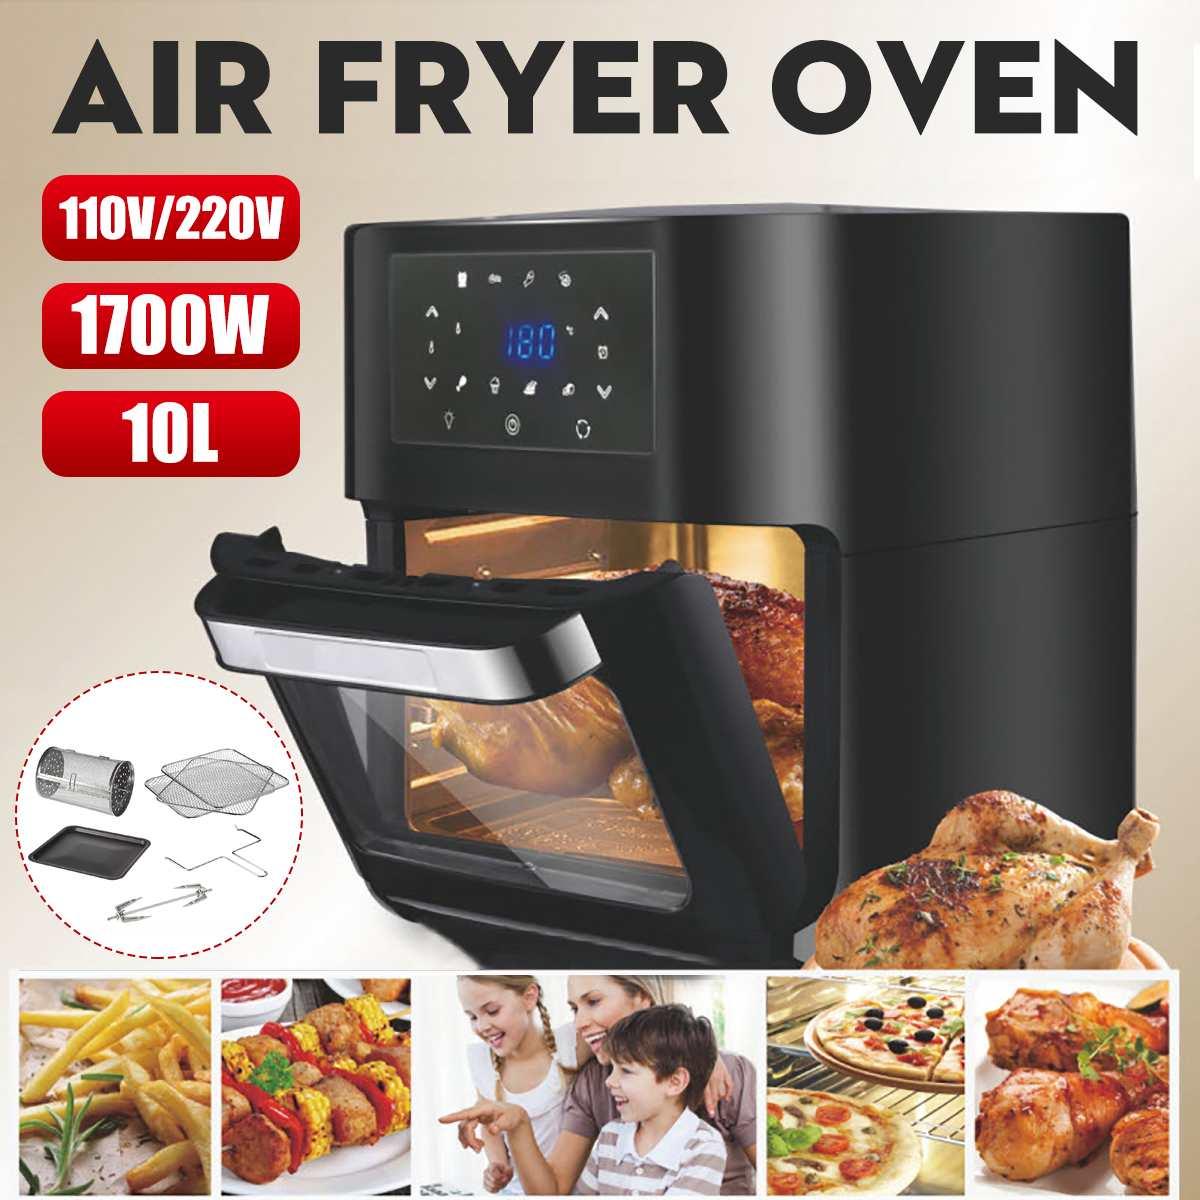 1700W 10L Multifunction Smart Fryer Chicken Oil Free Air Fryer Oven Healthy Food Fryer Cooker Touch LCD Electric Deep Fryer